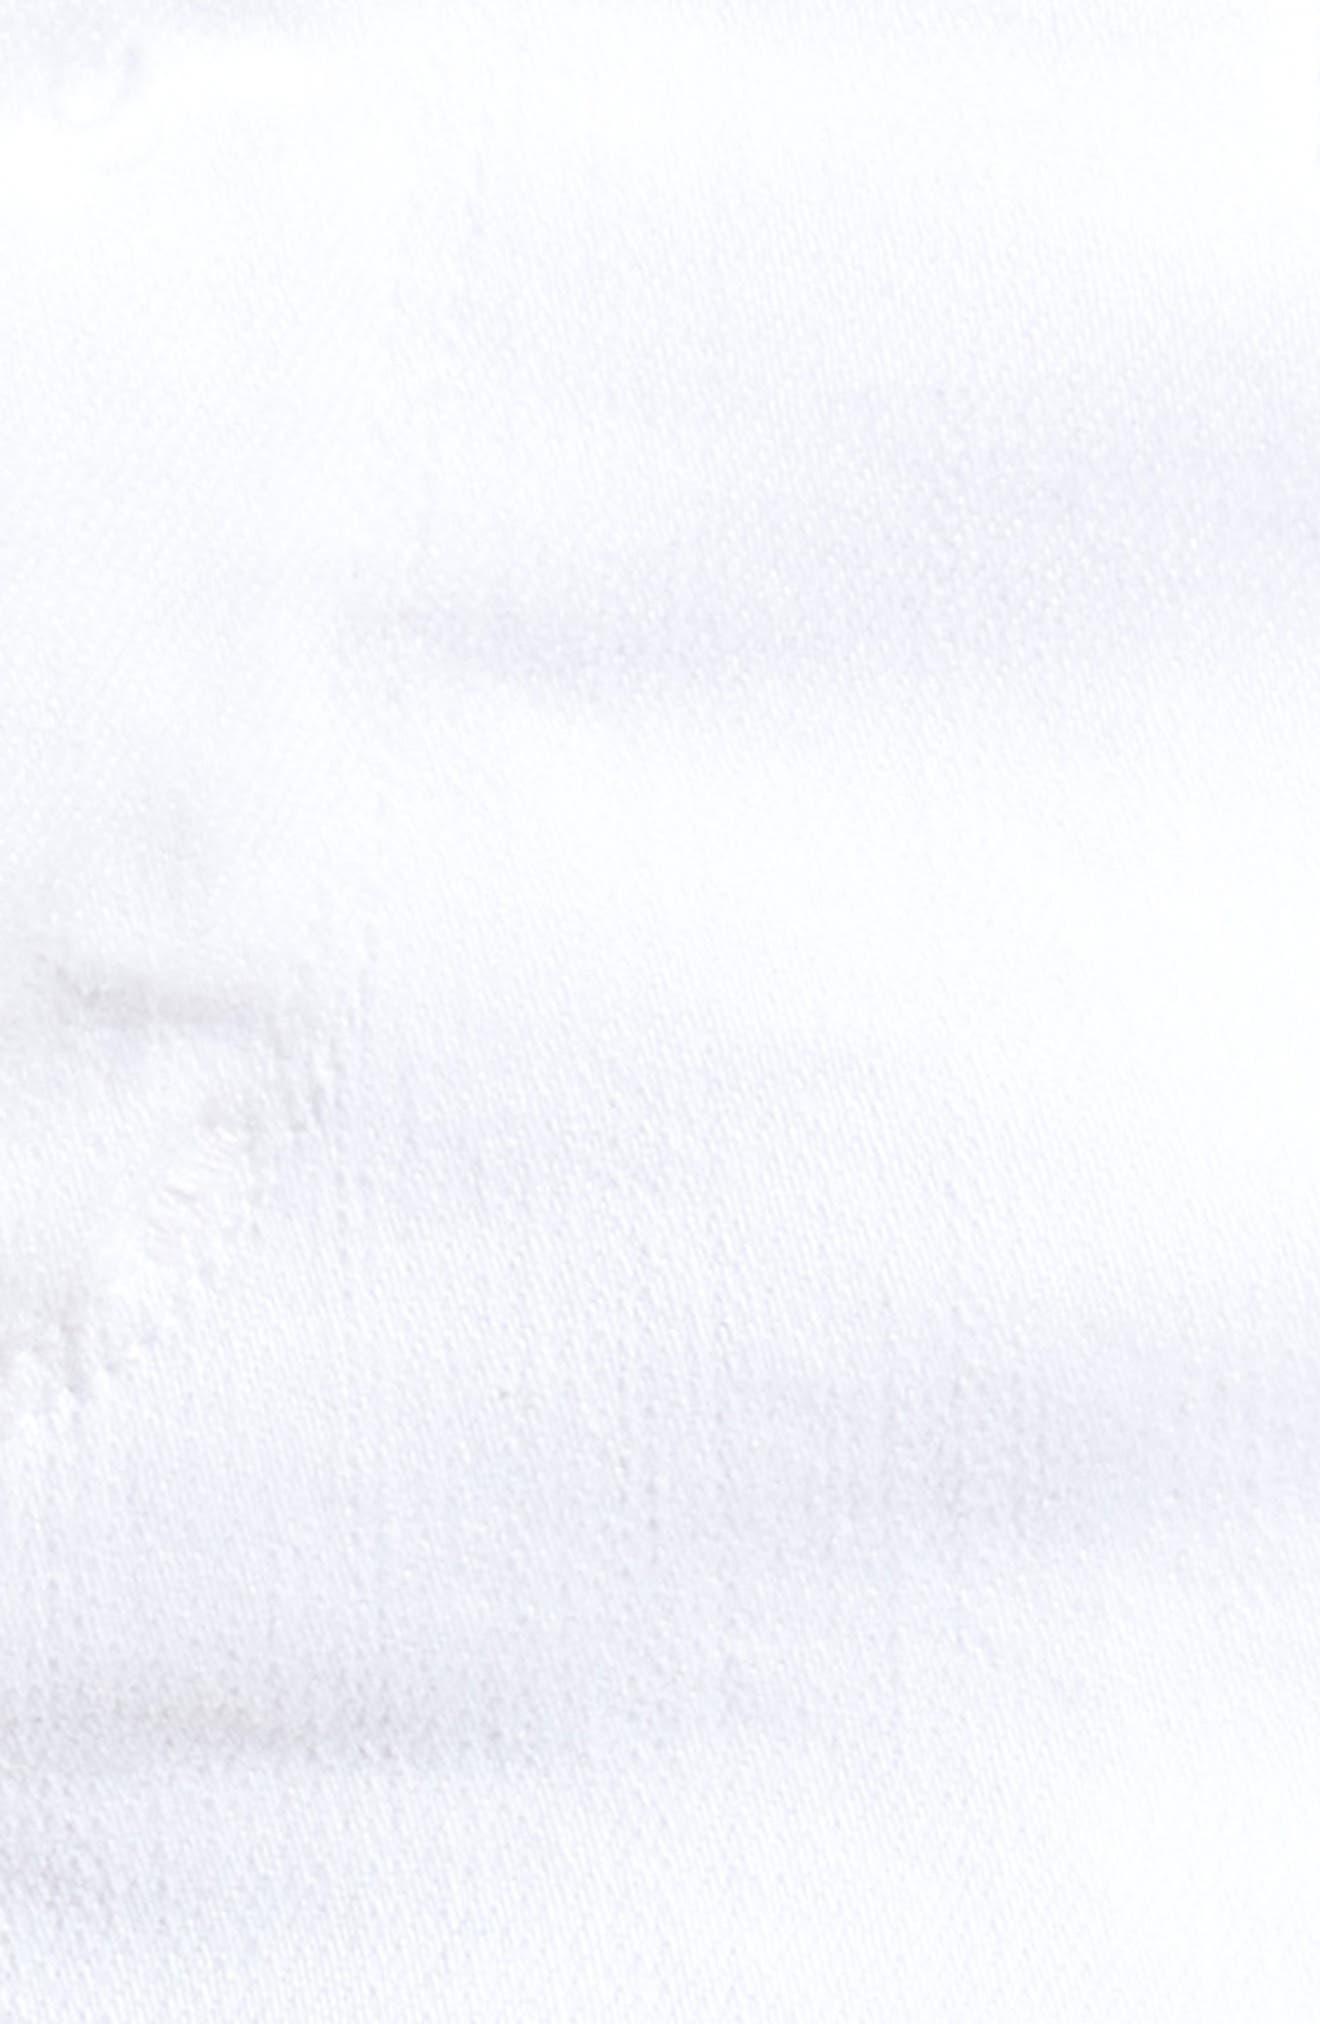 Ava Cutoff Denim Shorts,                             Alternate thumbnail 6, color,                             Optic White